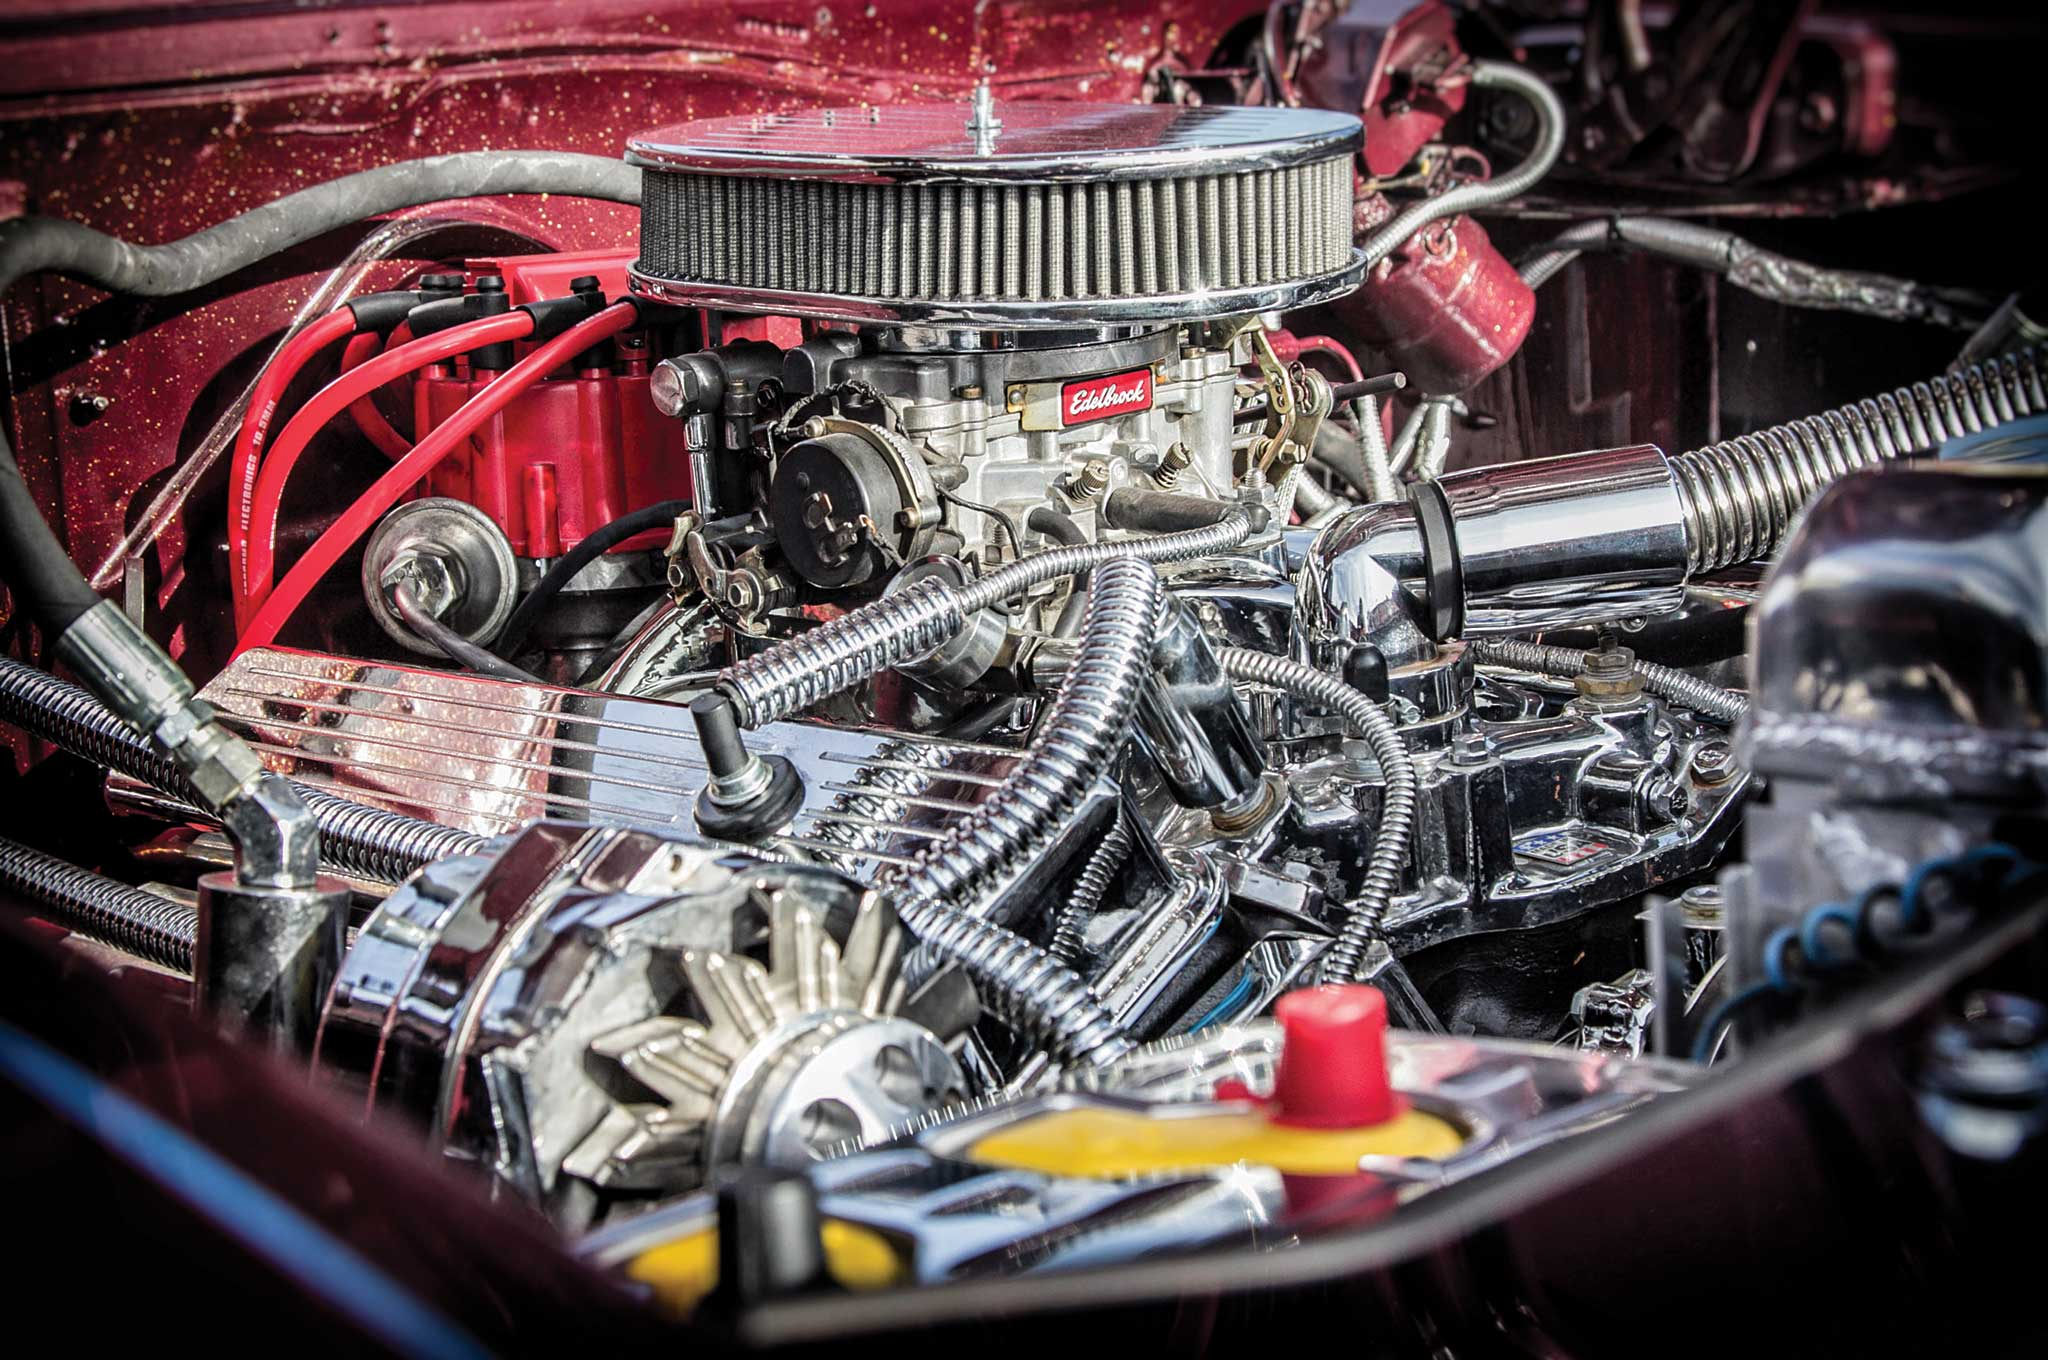 1966 chevrolet impala chevy small block 350 005